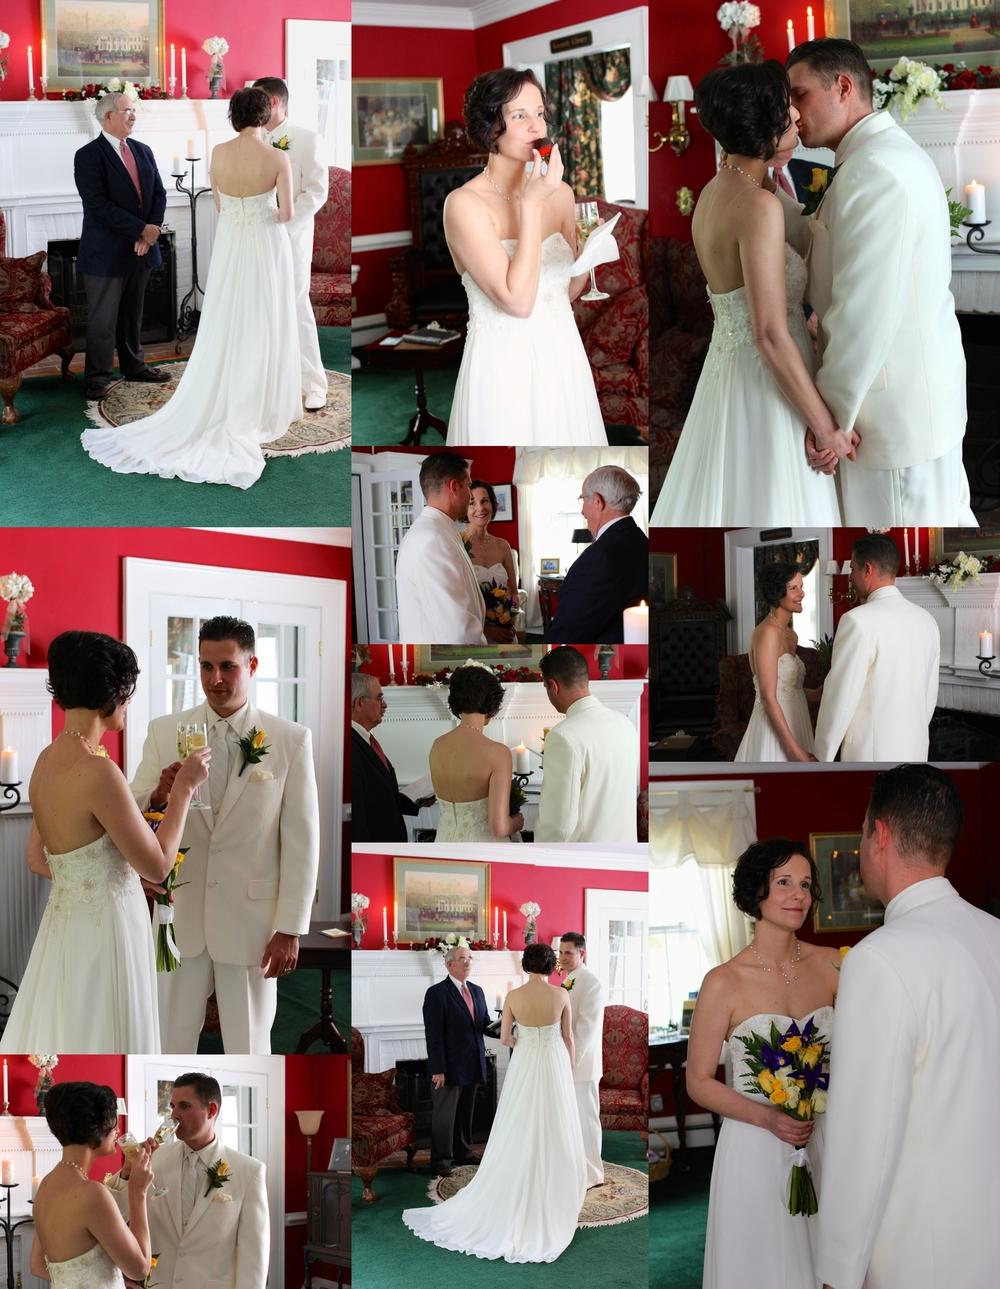 Dunn Wedding 43.jpg